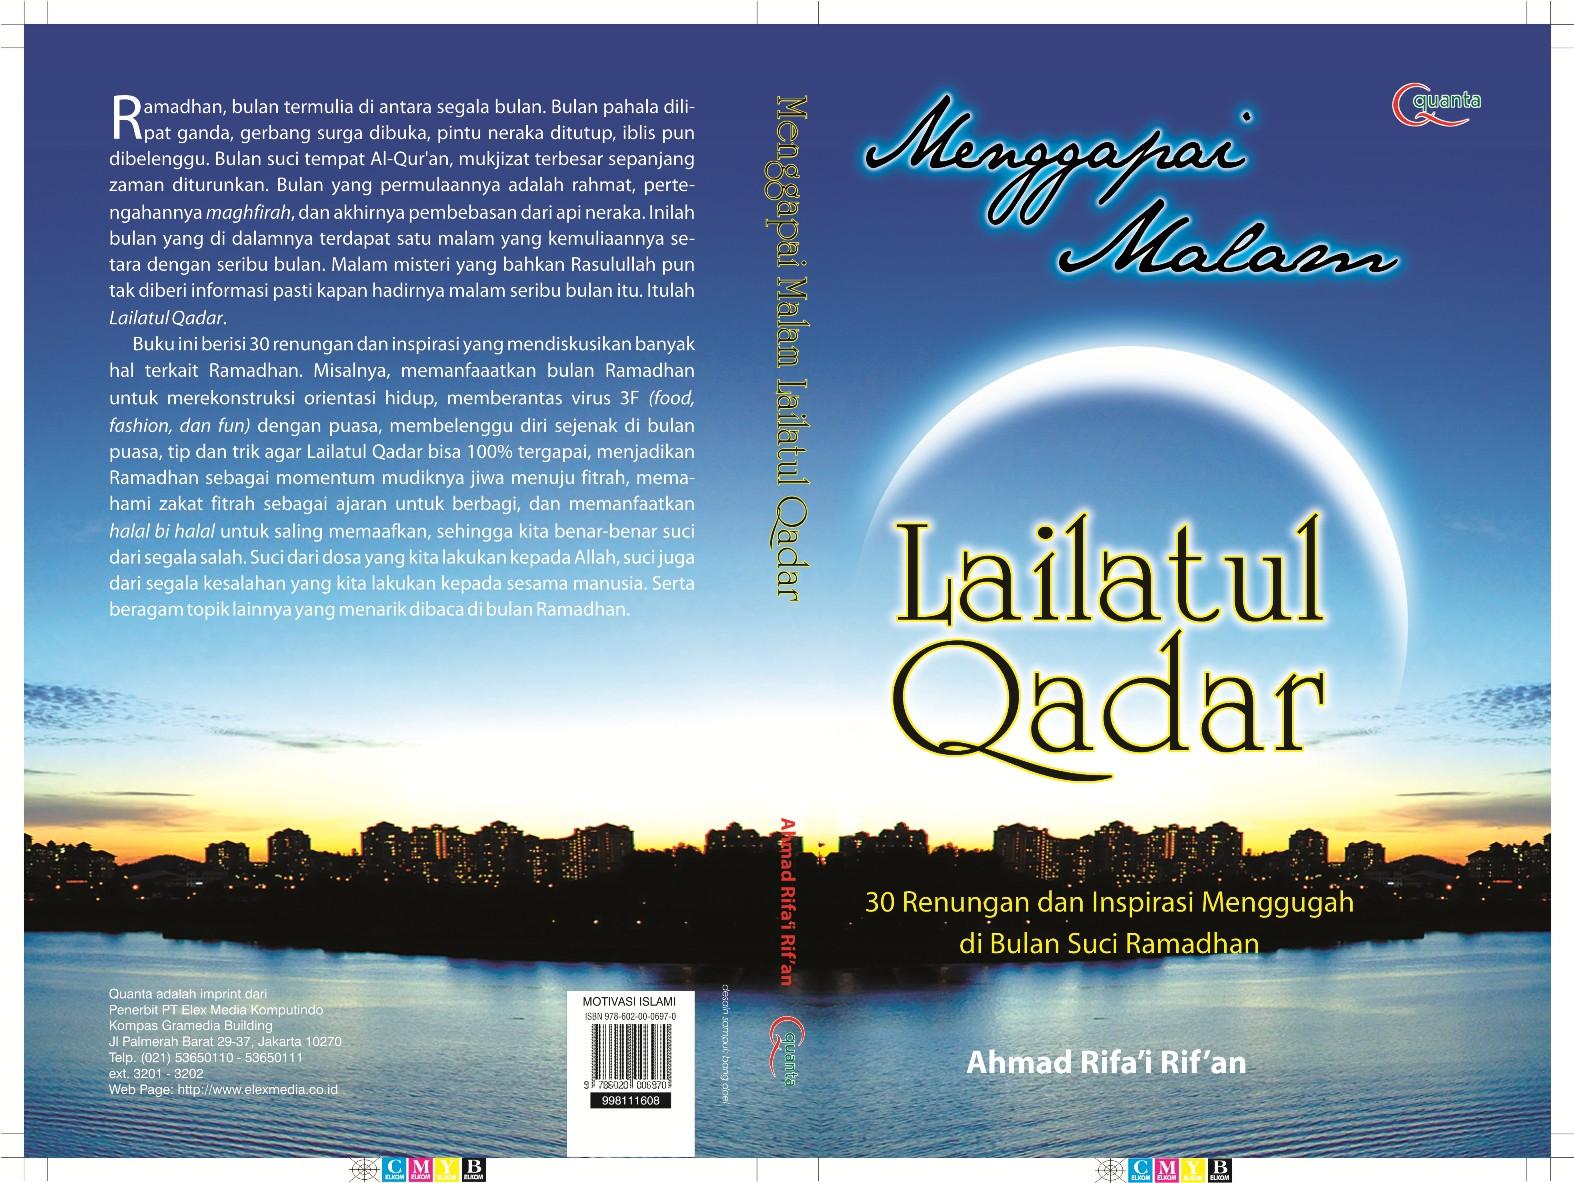 IKADI KOBAR Petuah Imam Ghazali Mencari Lailatul Qadar